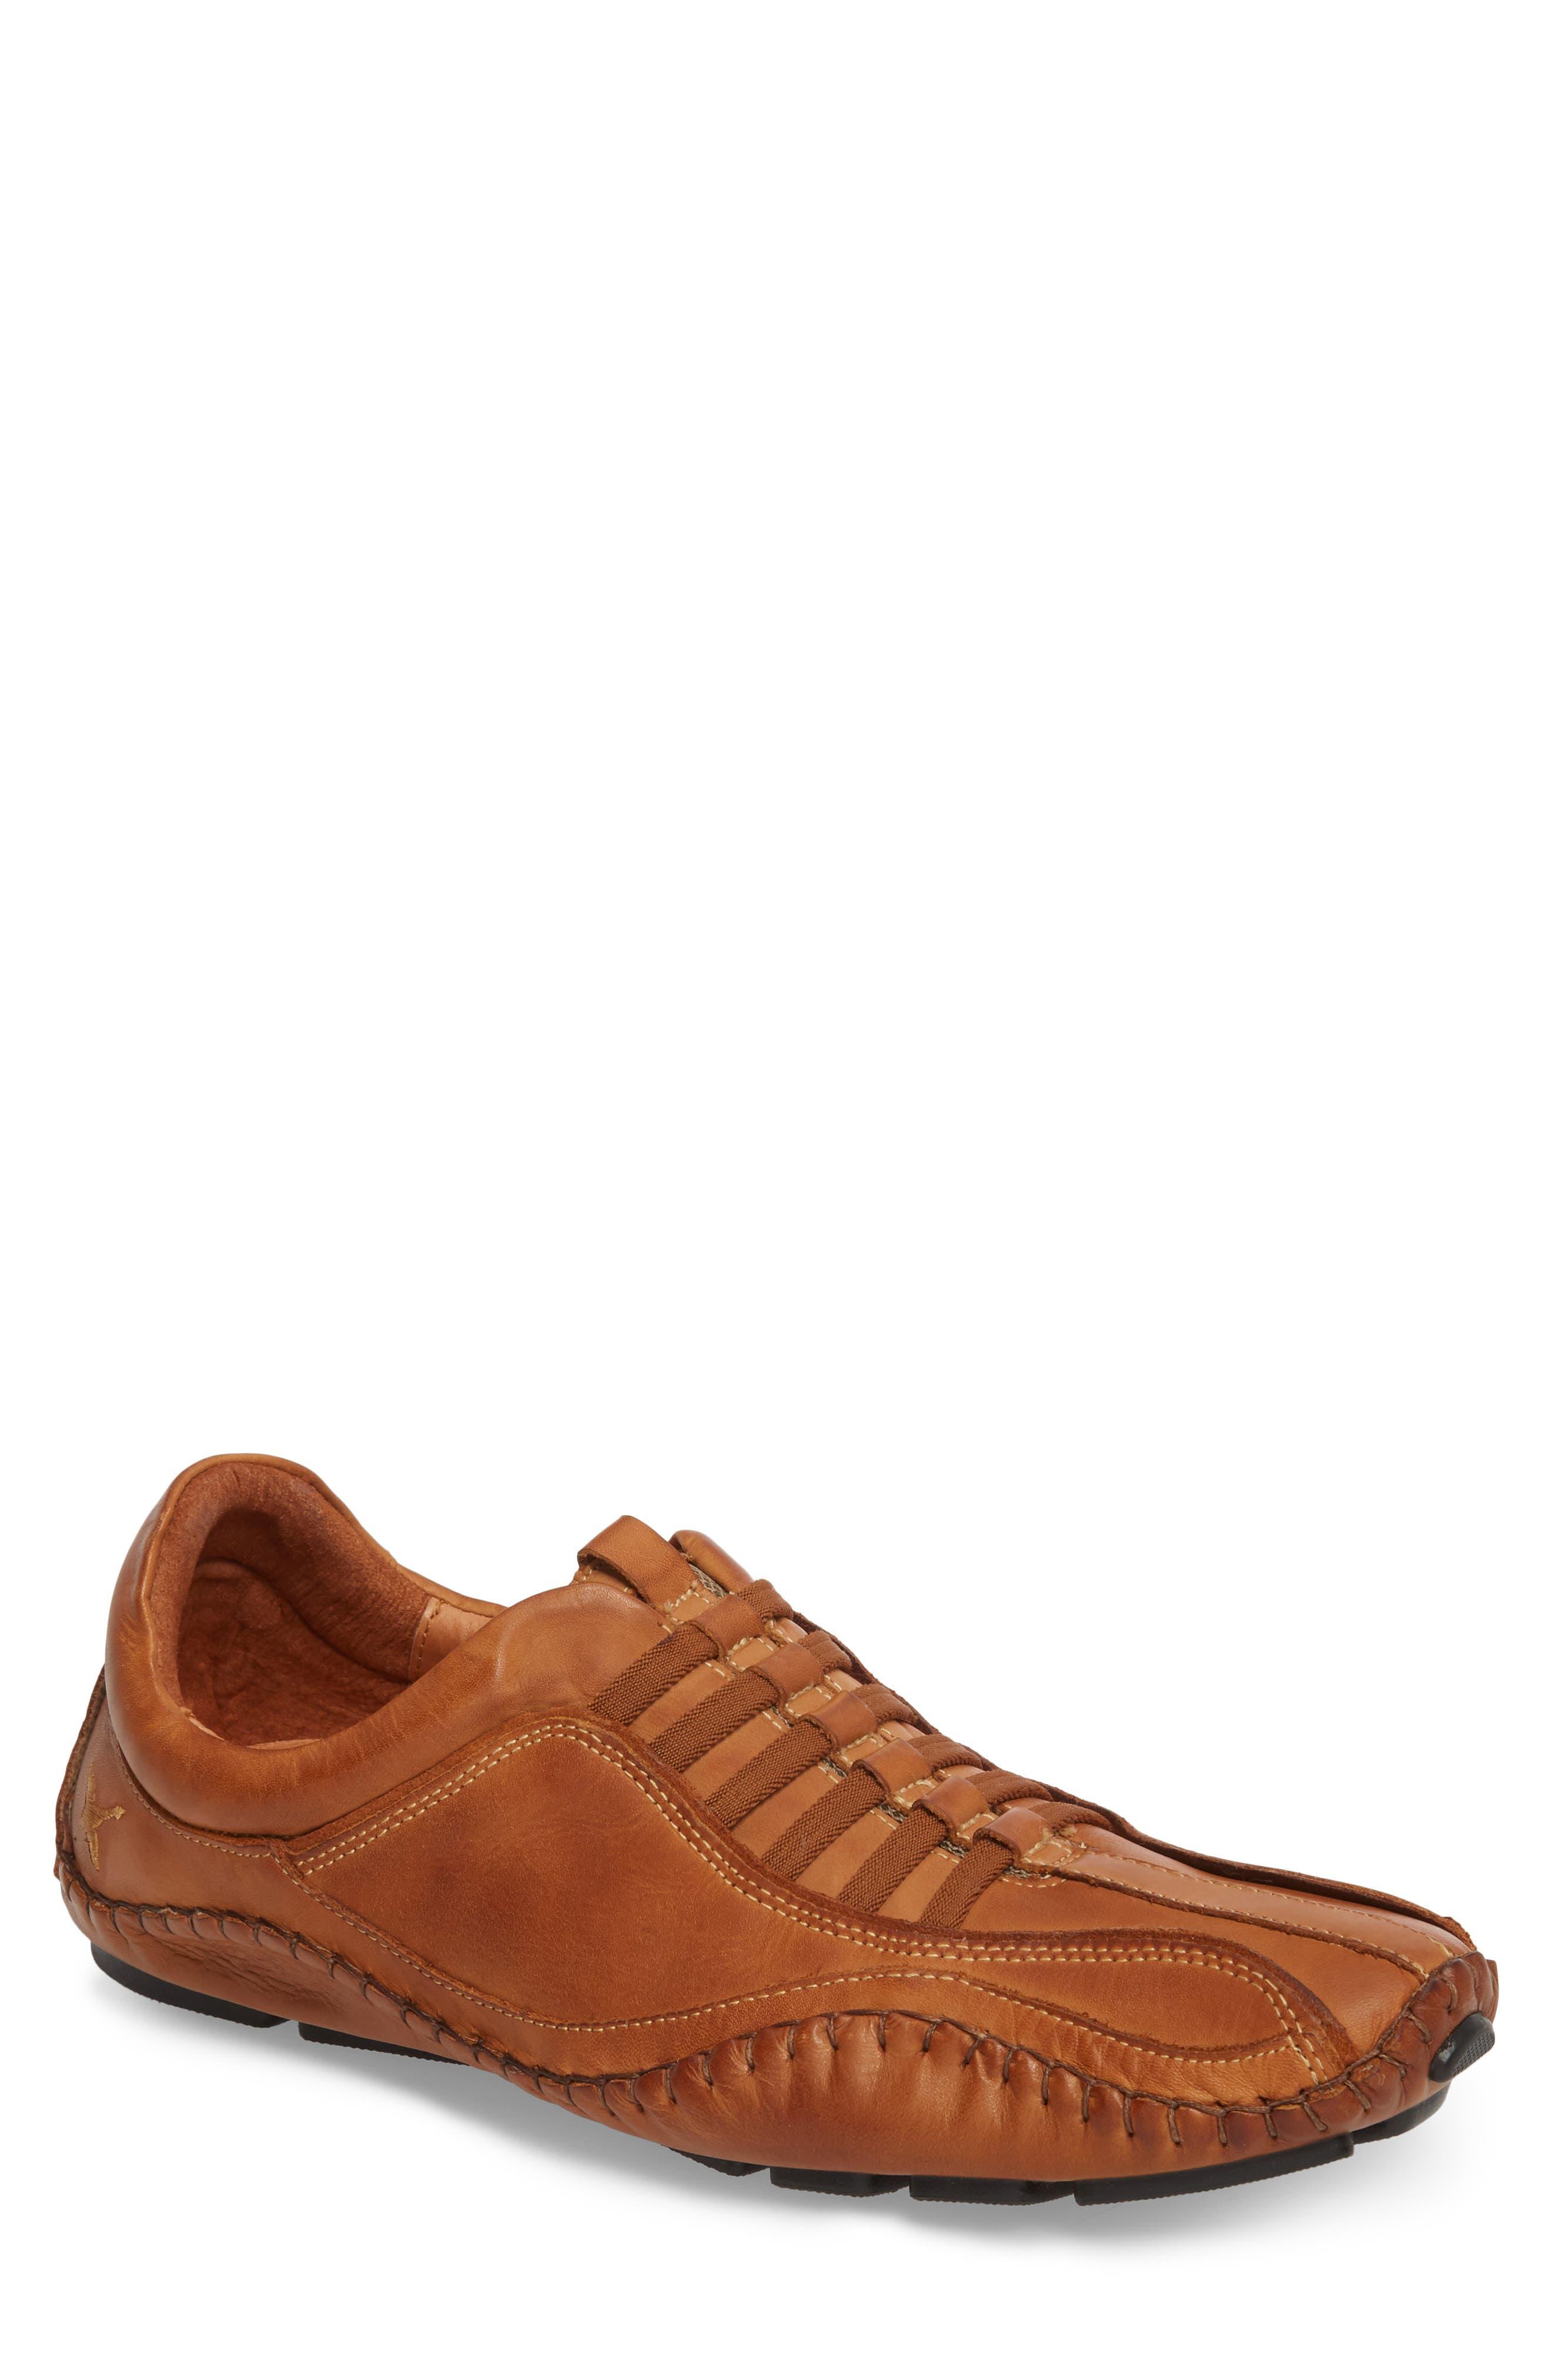 'Fuencarral' Driving Shoe,                             Main thumbnail 1, color,                             Light Brown